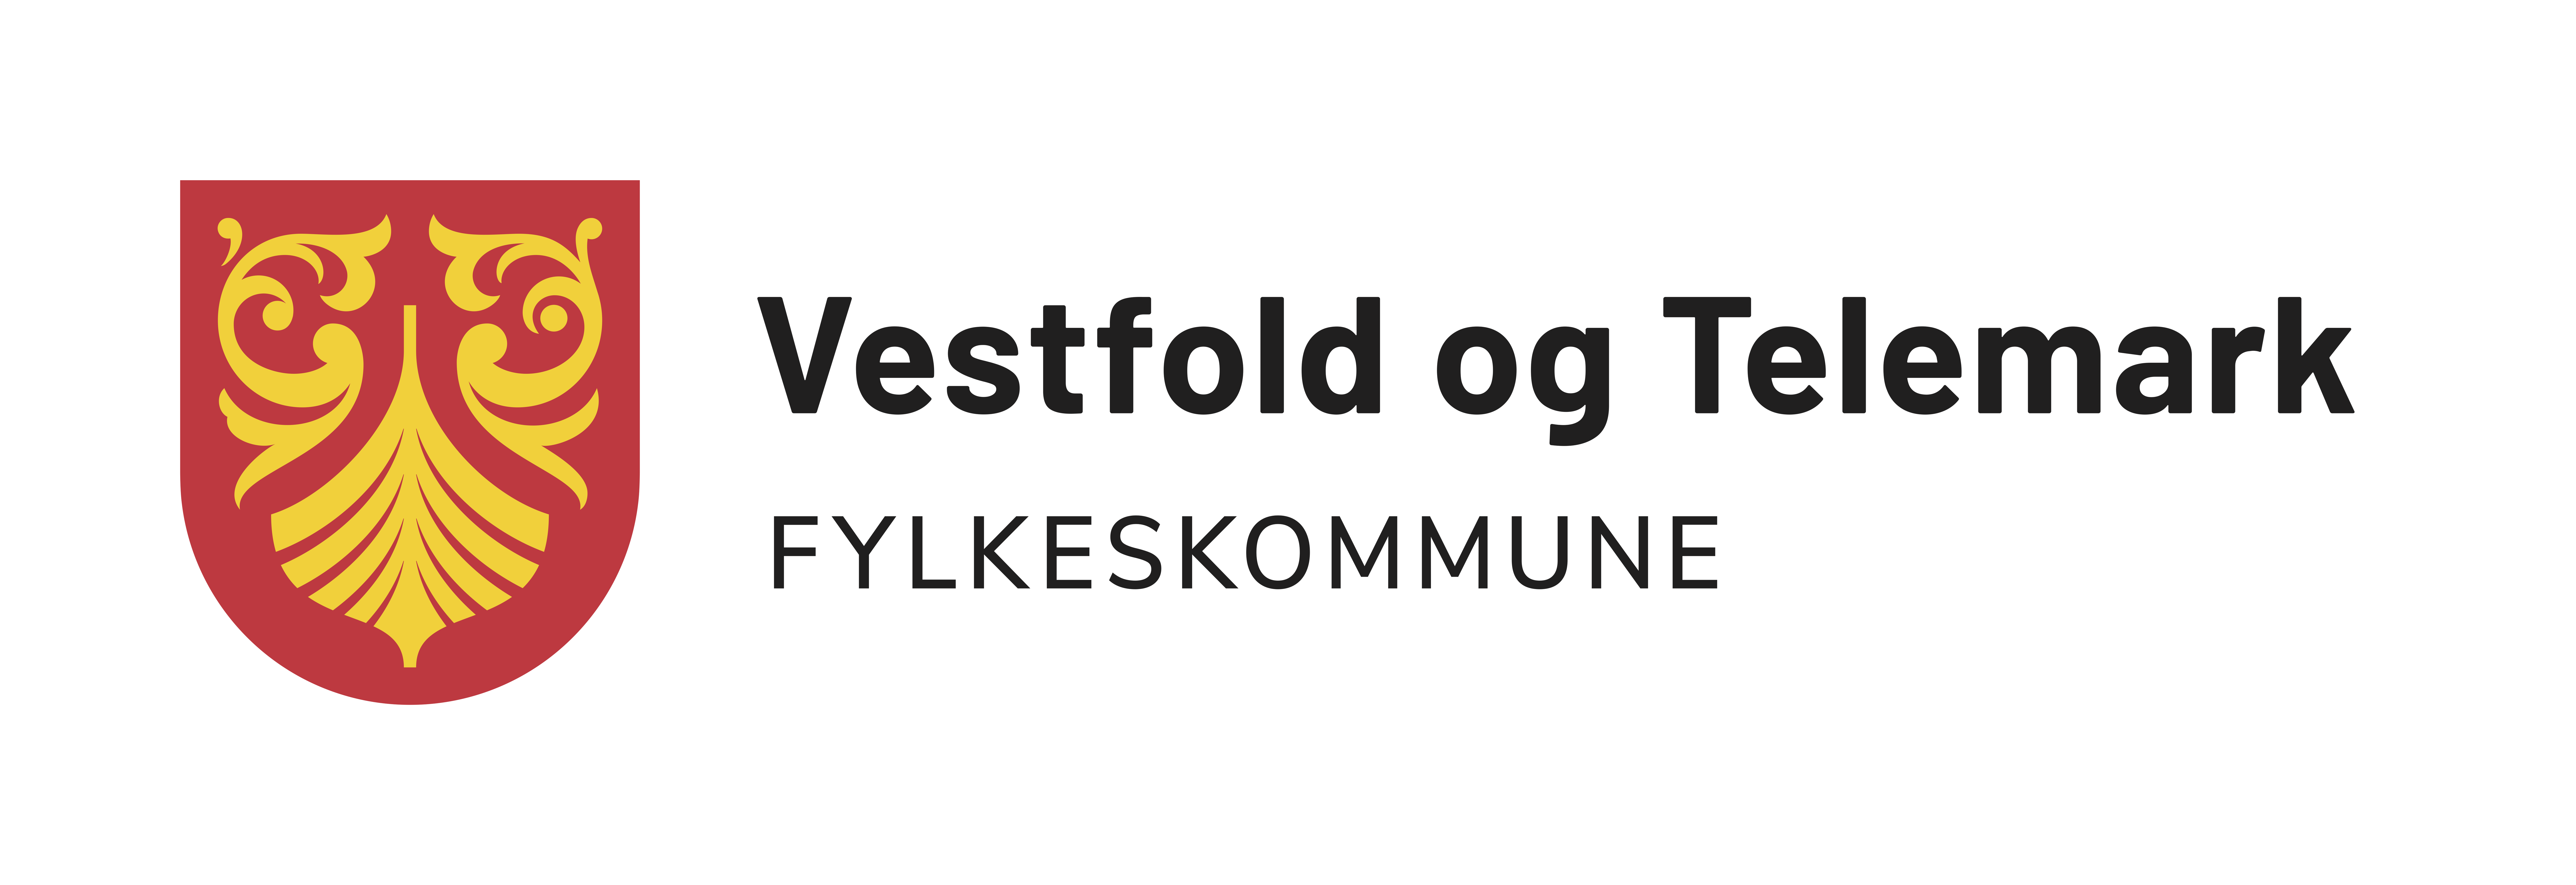 https://industriuka.no/wp-content/uploads/2021/10/vtfk-alternativ-logo-cmyk.png